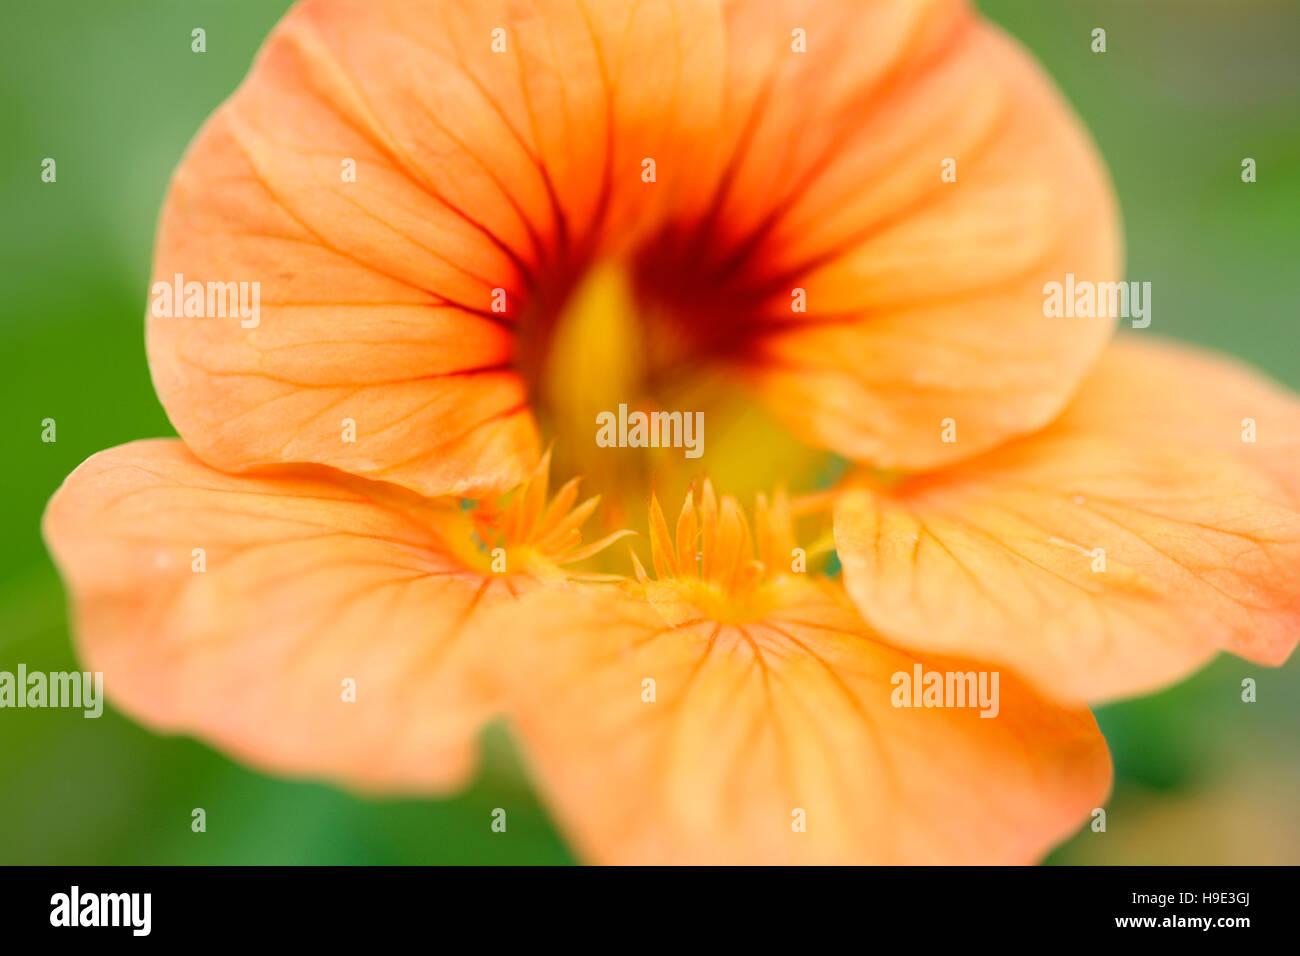 beautiful eye-catching deep orange nasturtium flowers, prolific grower, great in salads  Jane Ann Butler Photography JABP1720 Stock Photo